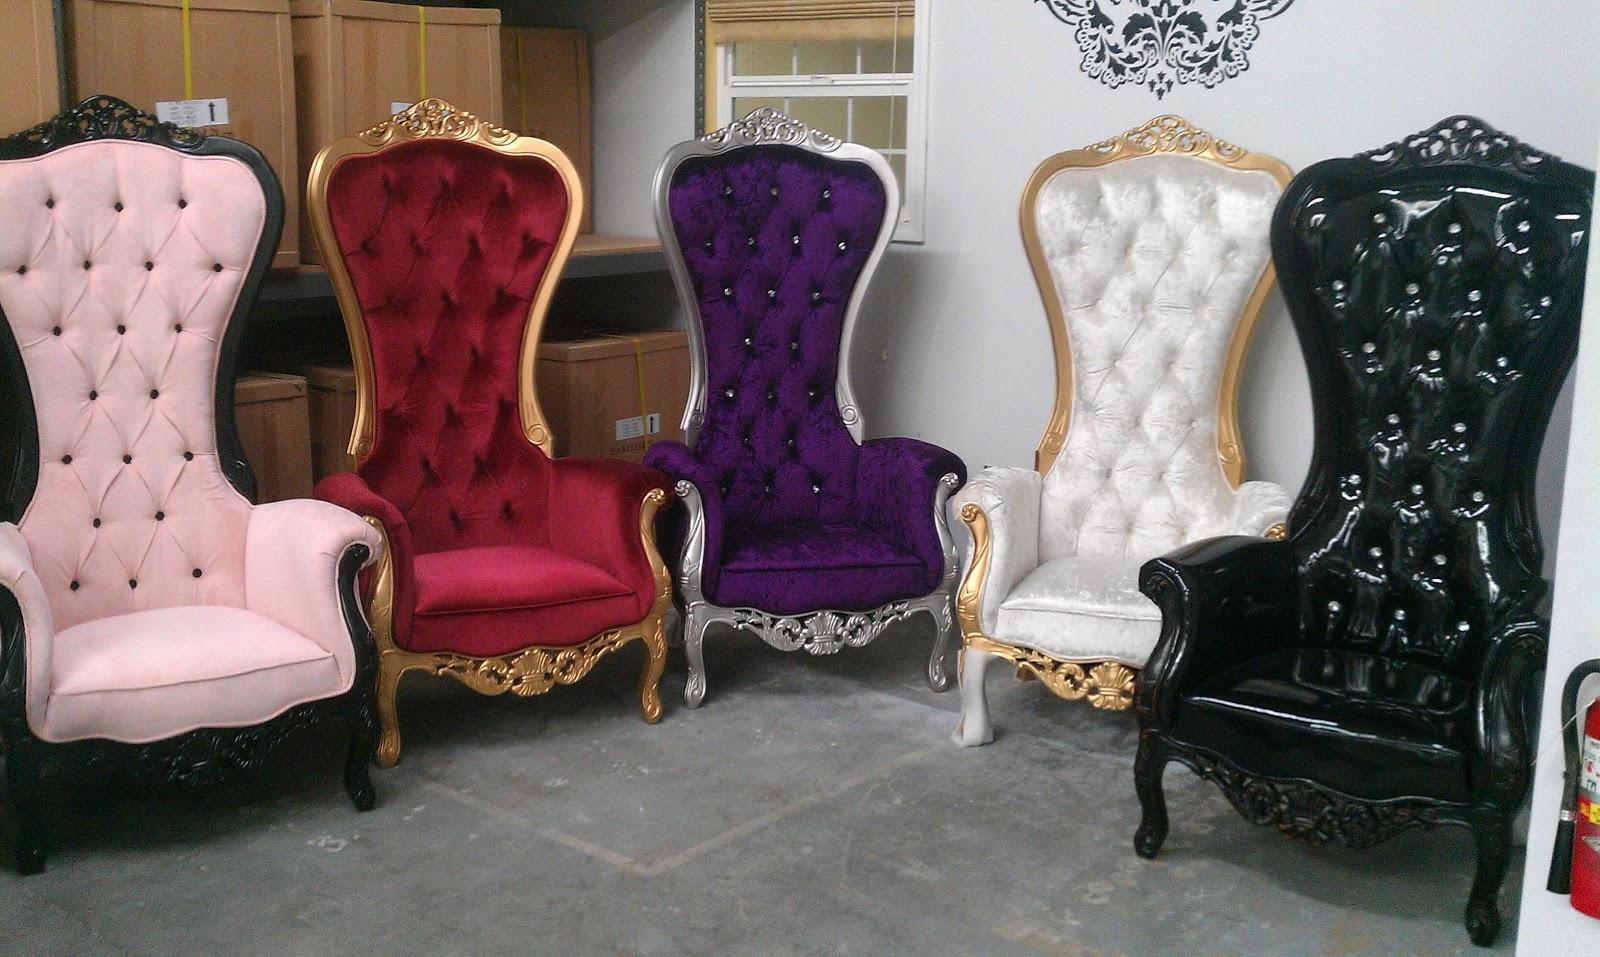 Royal Chair Rentals  bangkokfoodietourcom